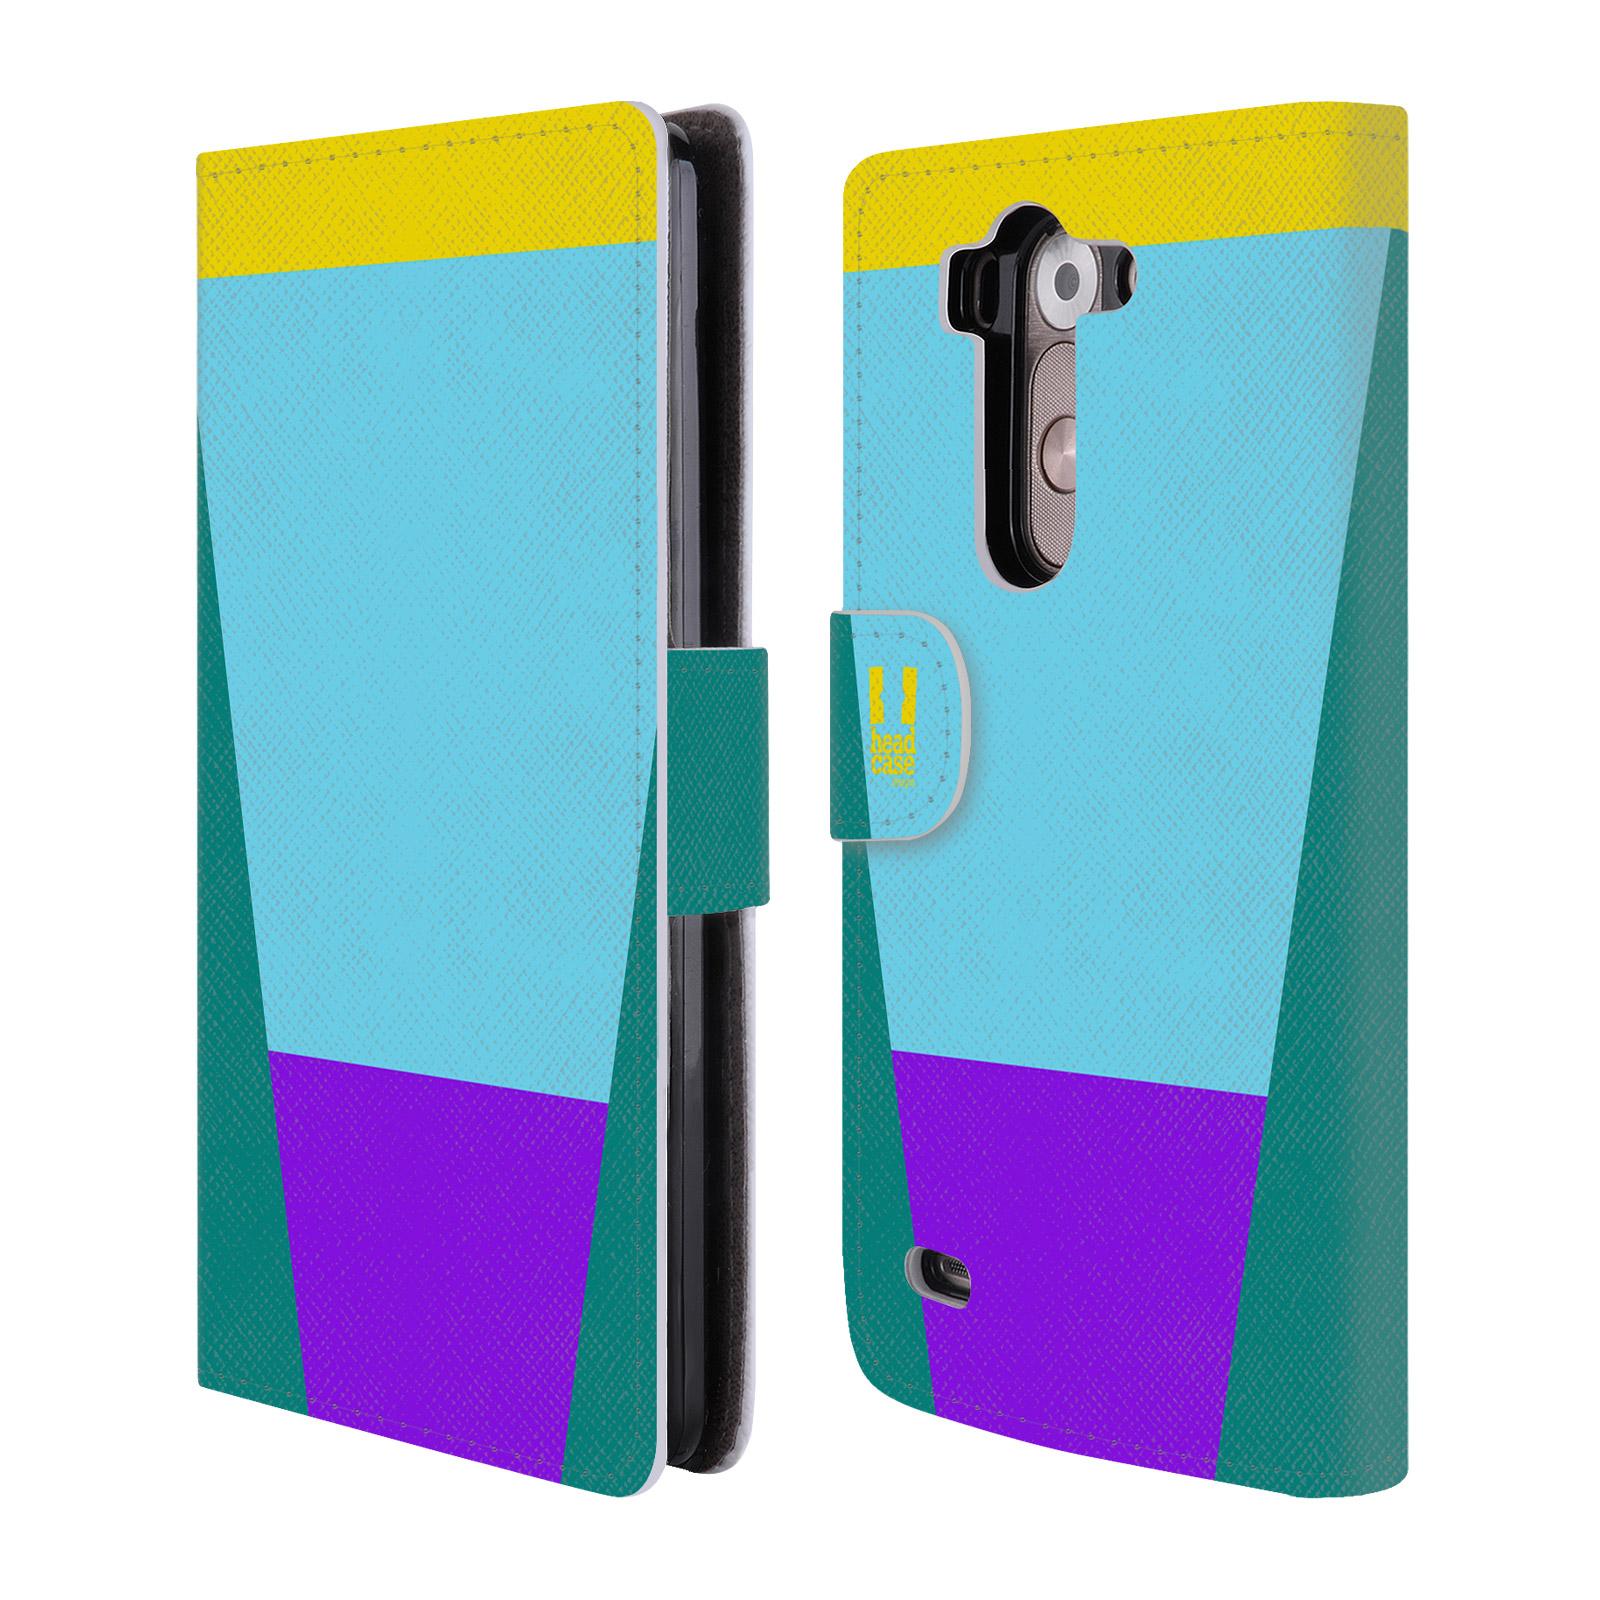 HEAD CASE Flipové pouzdro pro mobil LG G3s barevné tvary nebesky modrá